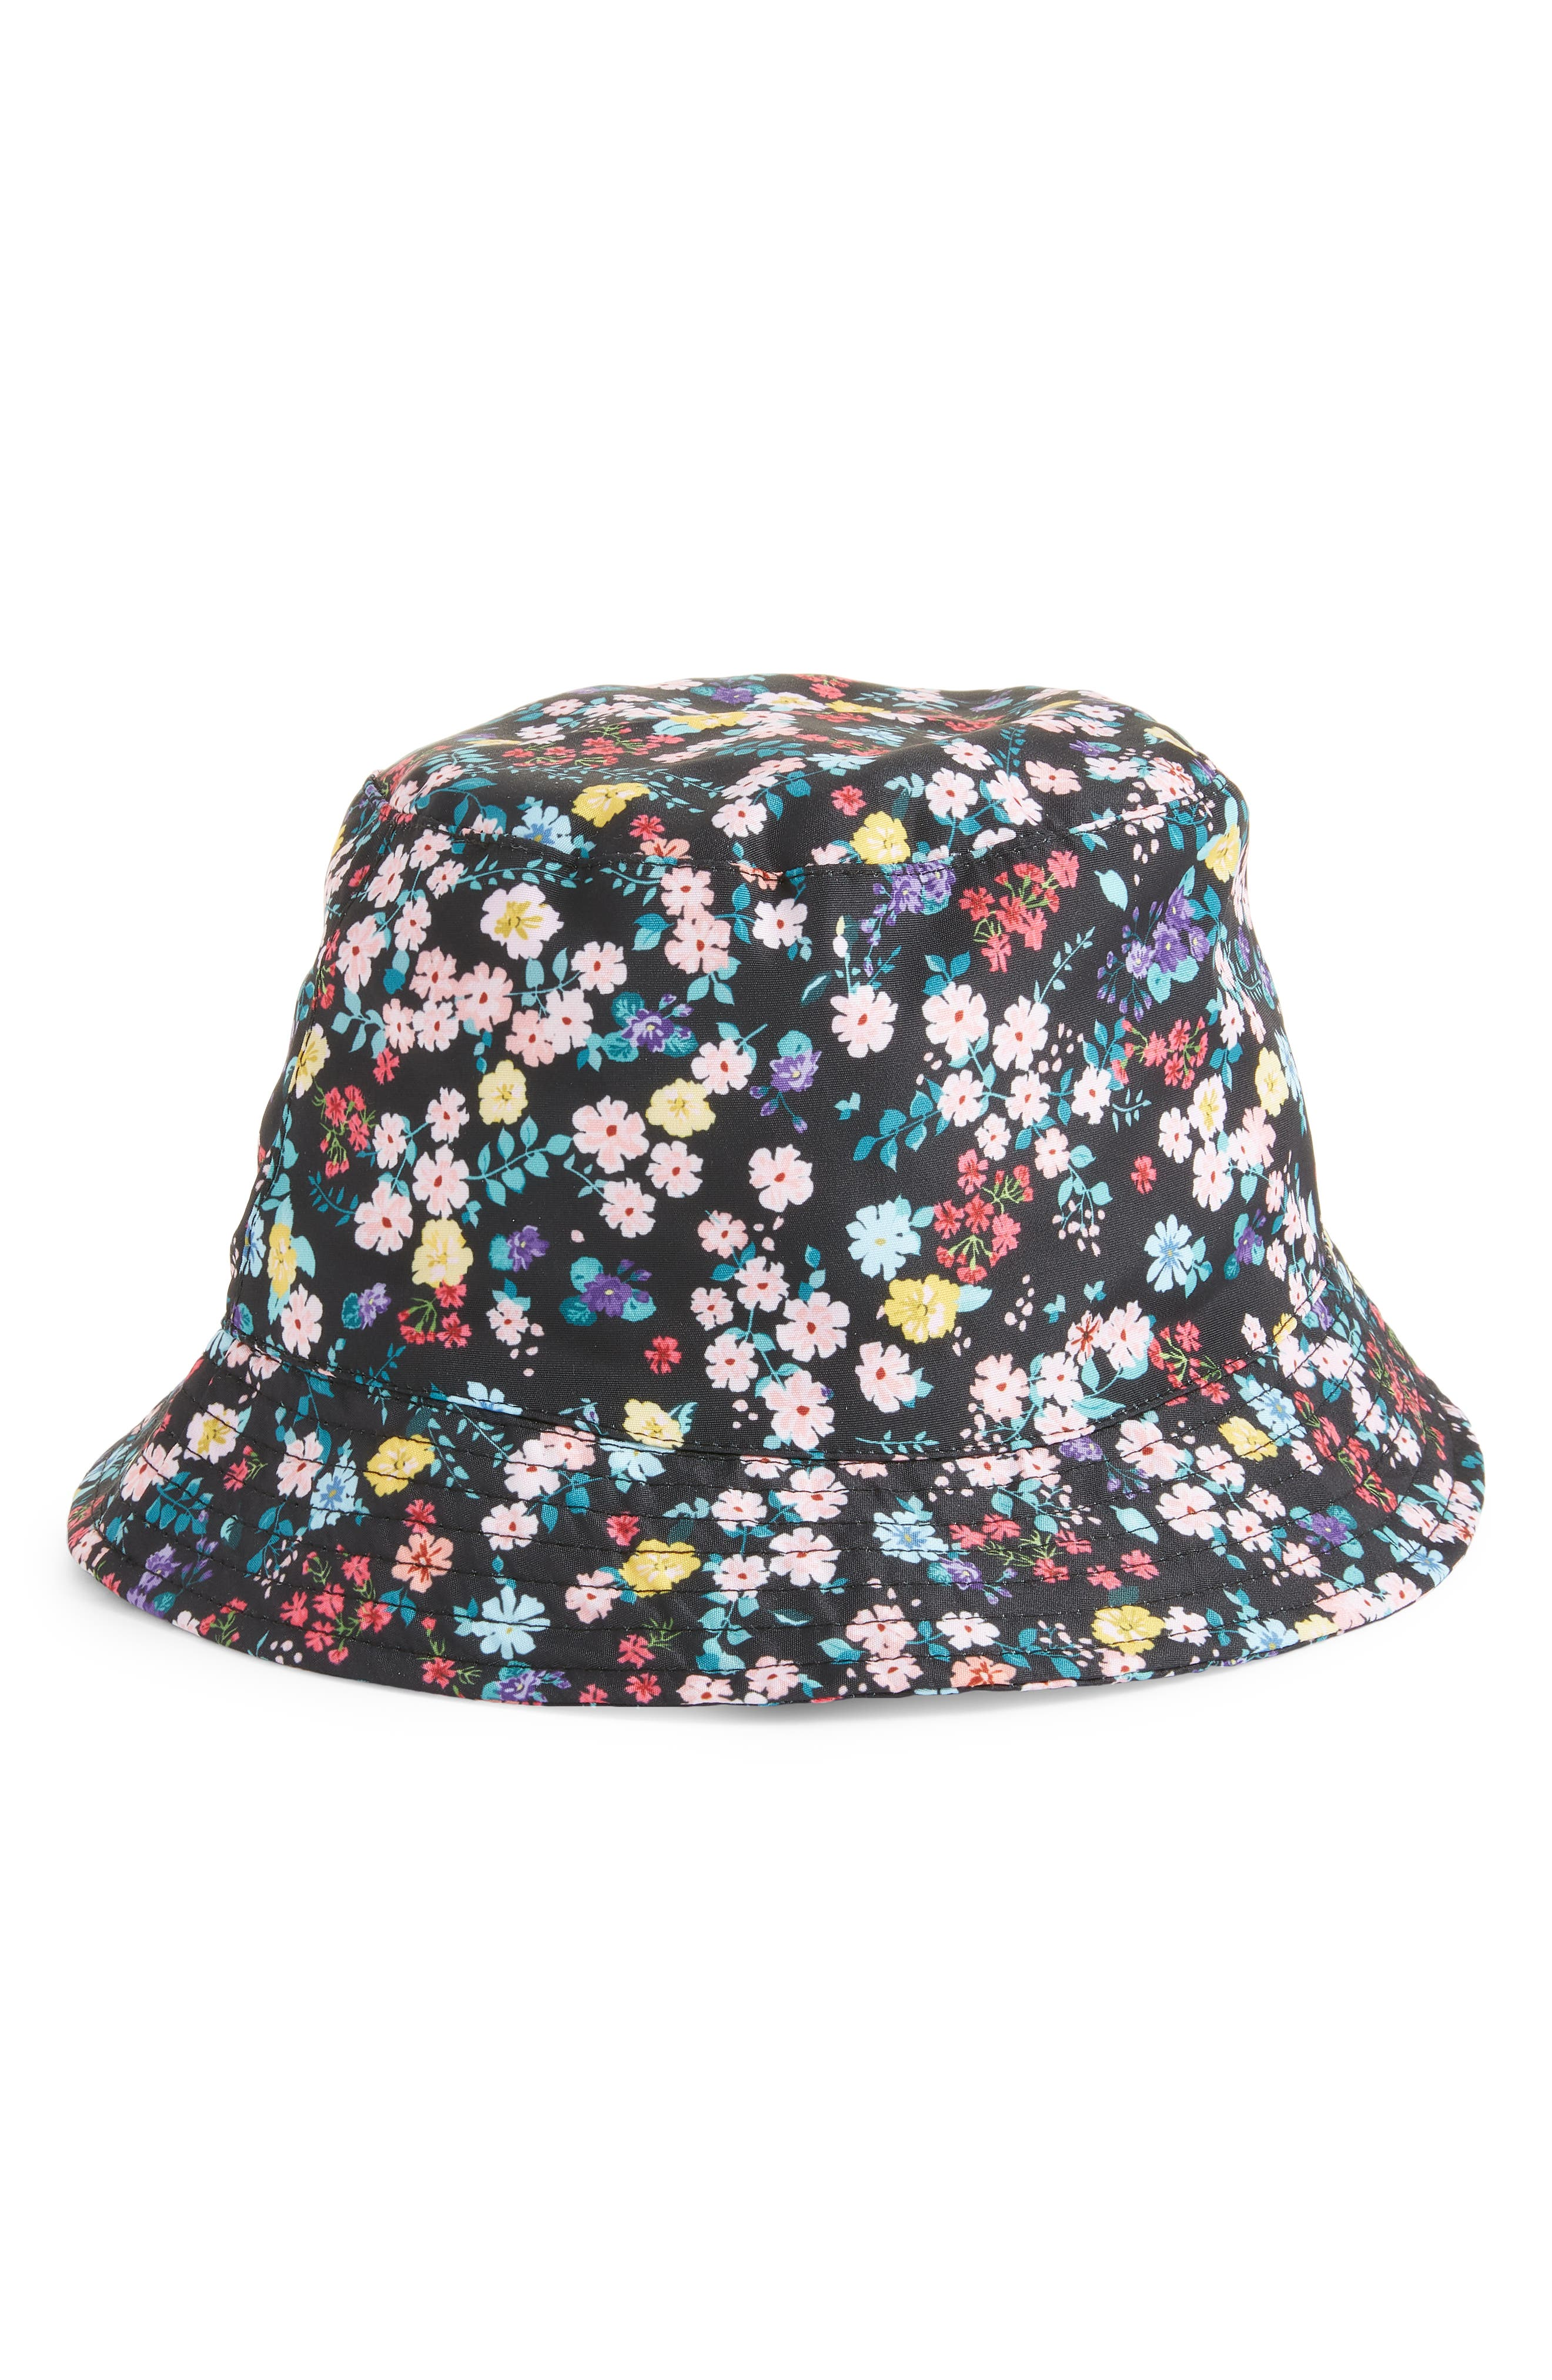 Bp. Hats FLORAL PRINT BUCKET HAT